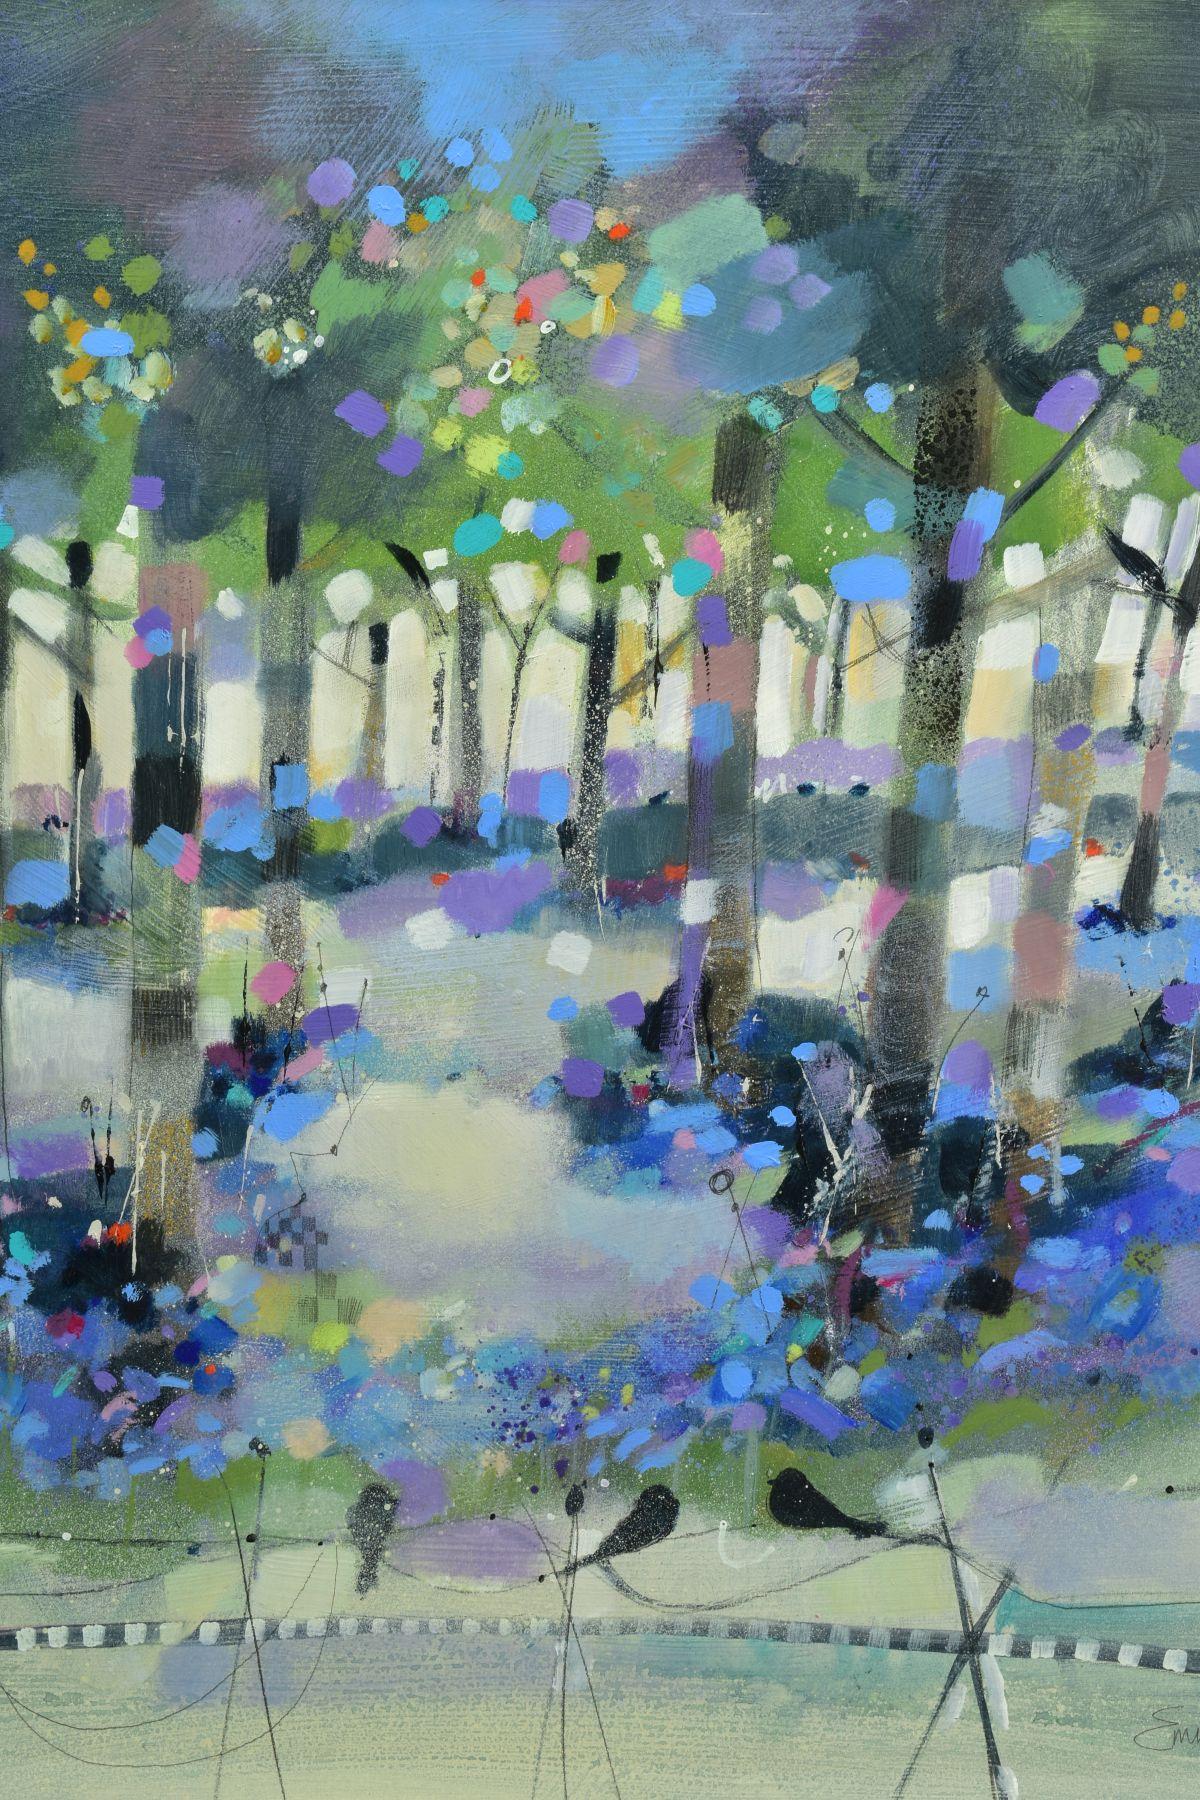 EMMA S. DAVIS (SCOTTISH 1975), 'Into The Woods', a colourful woodland landscape, signed bottom - Image 2 of 7